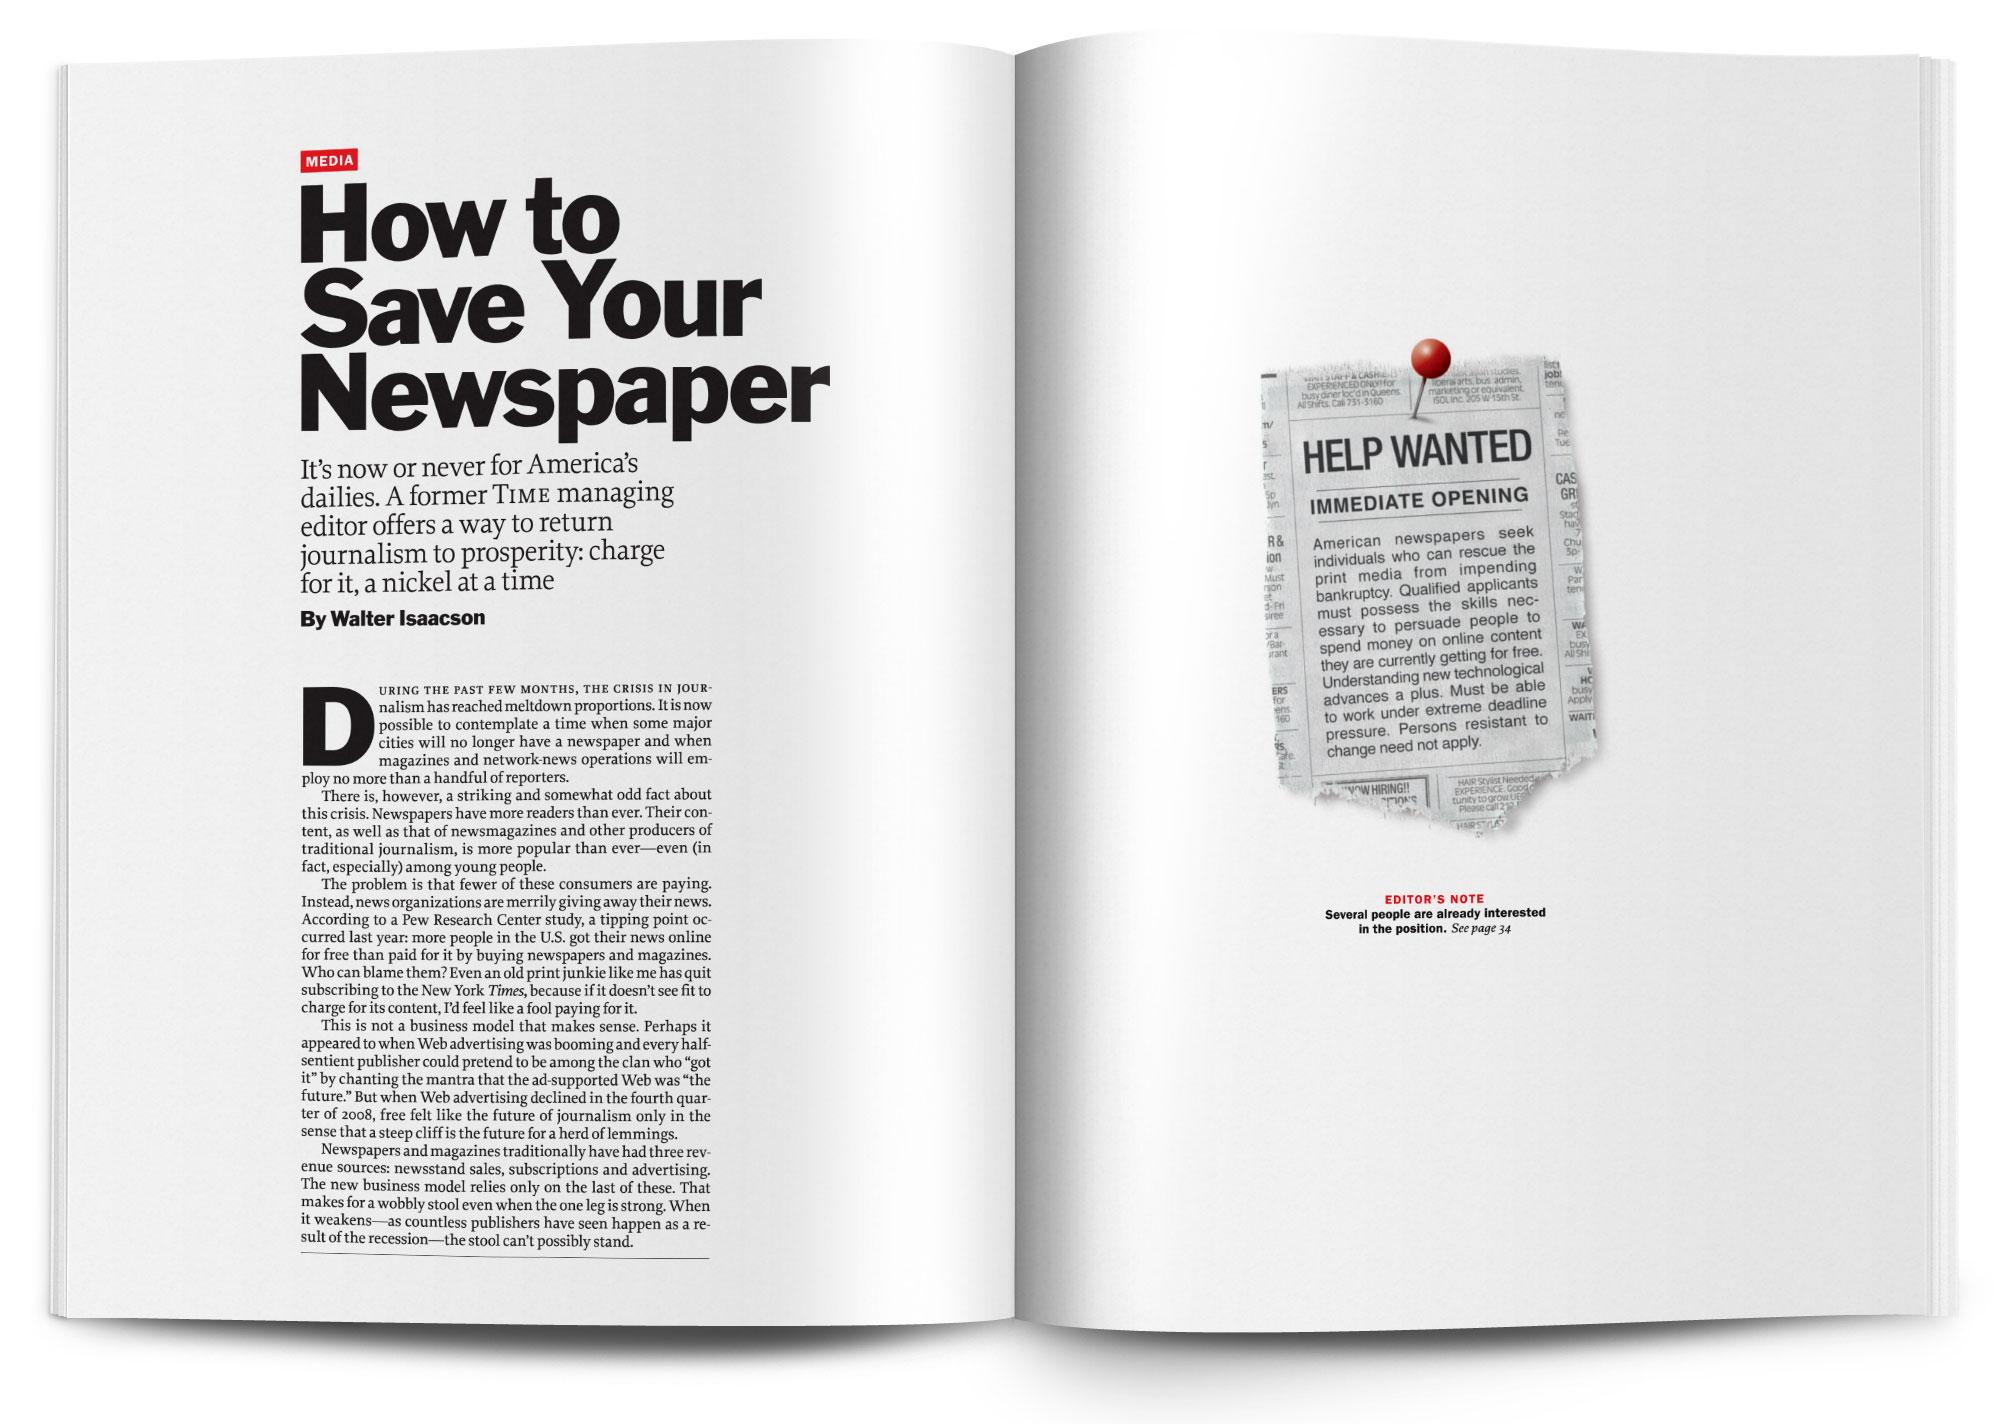 layouts.savenewspaper.jpg